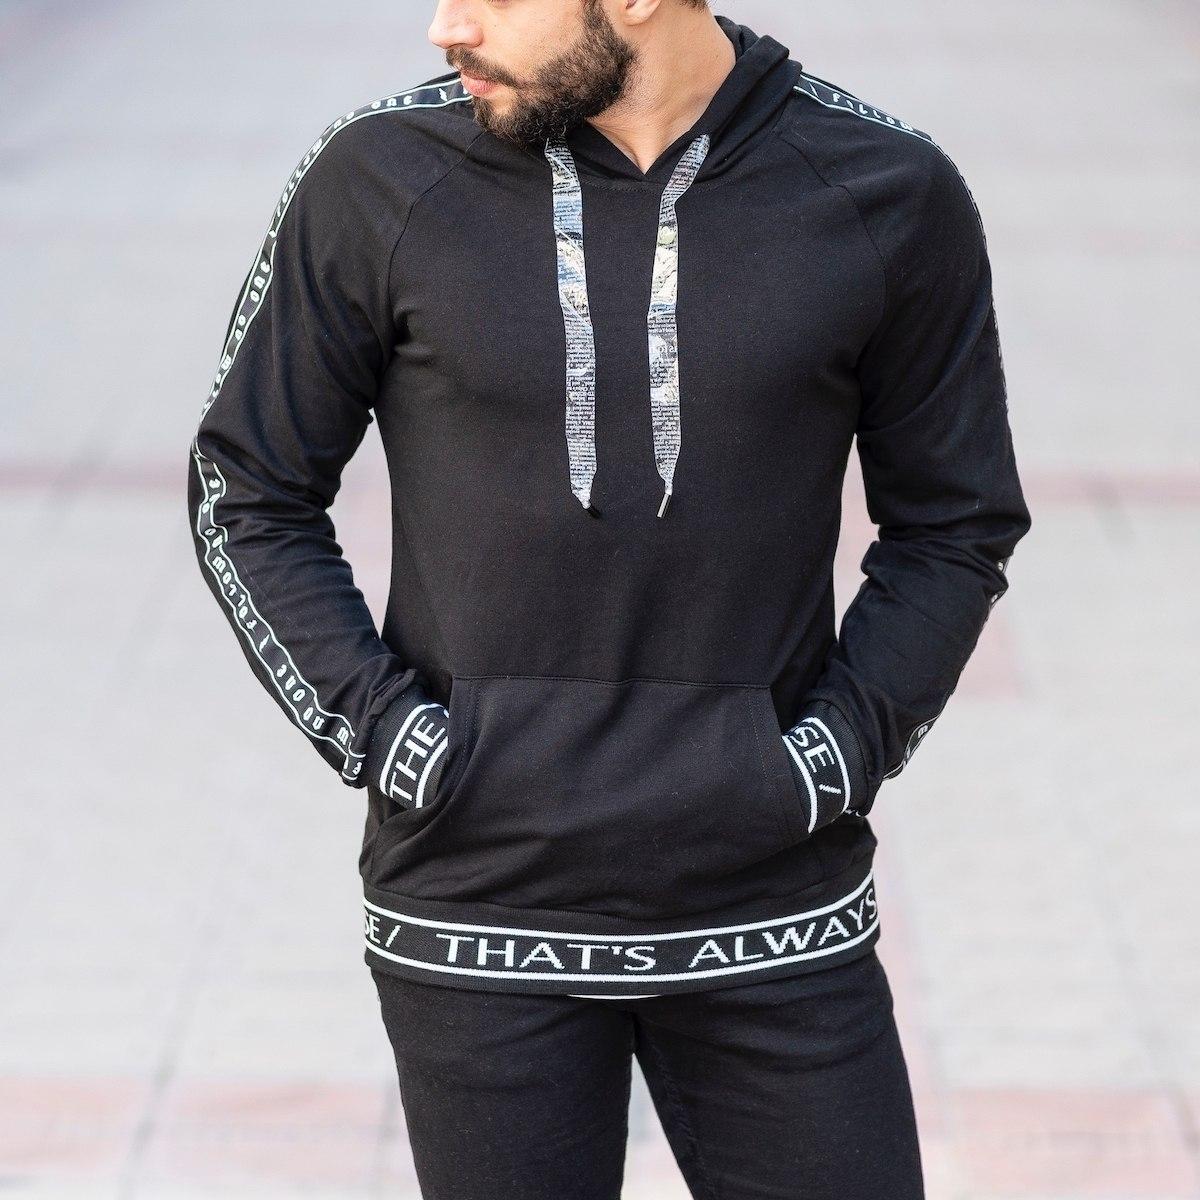 Black Sweatshirt With Text...